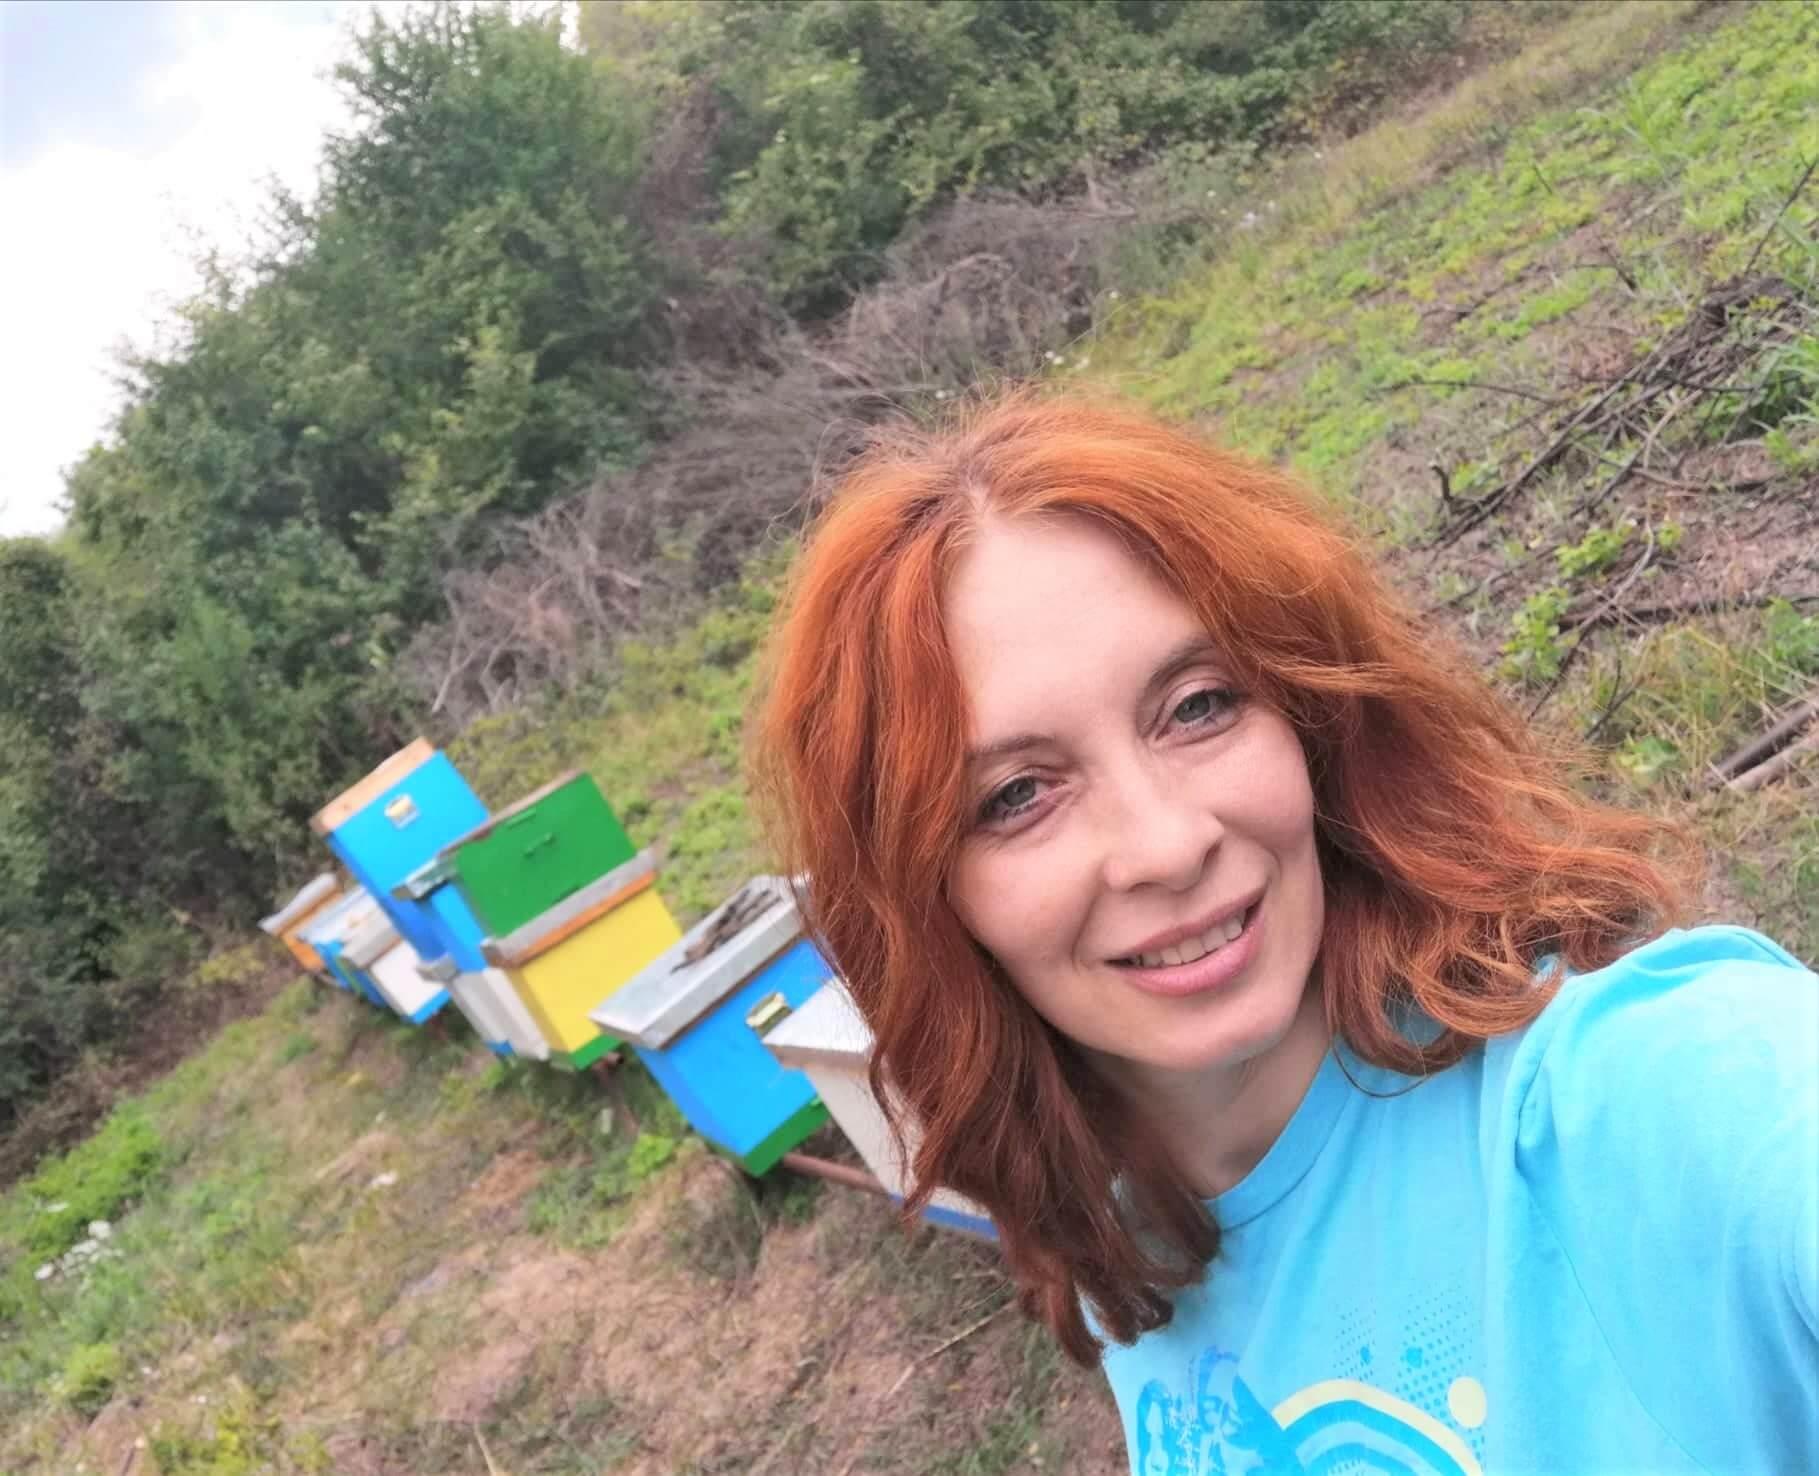 foto: Snežana Radosavljević u svom pčelinjaku